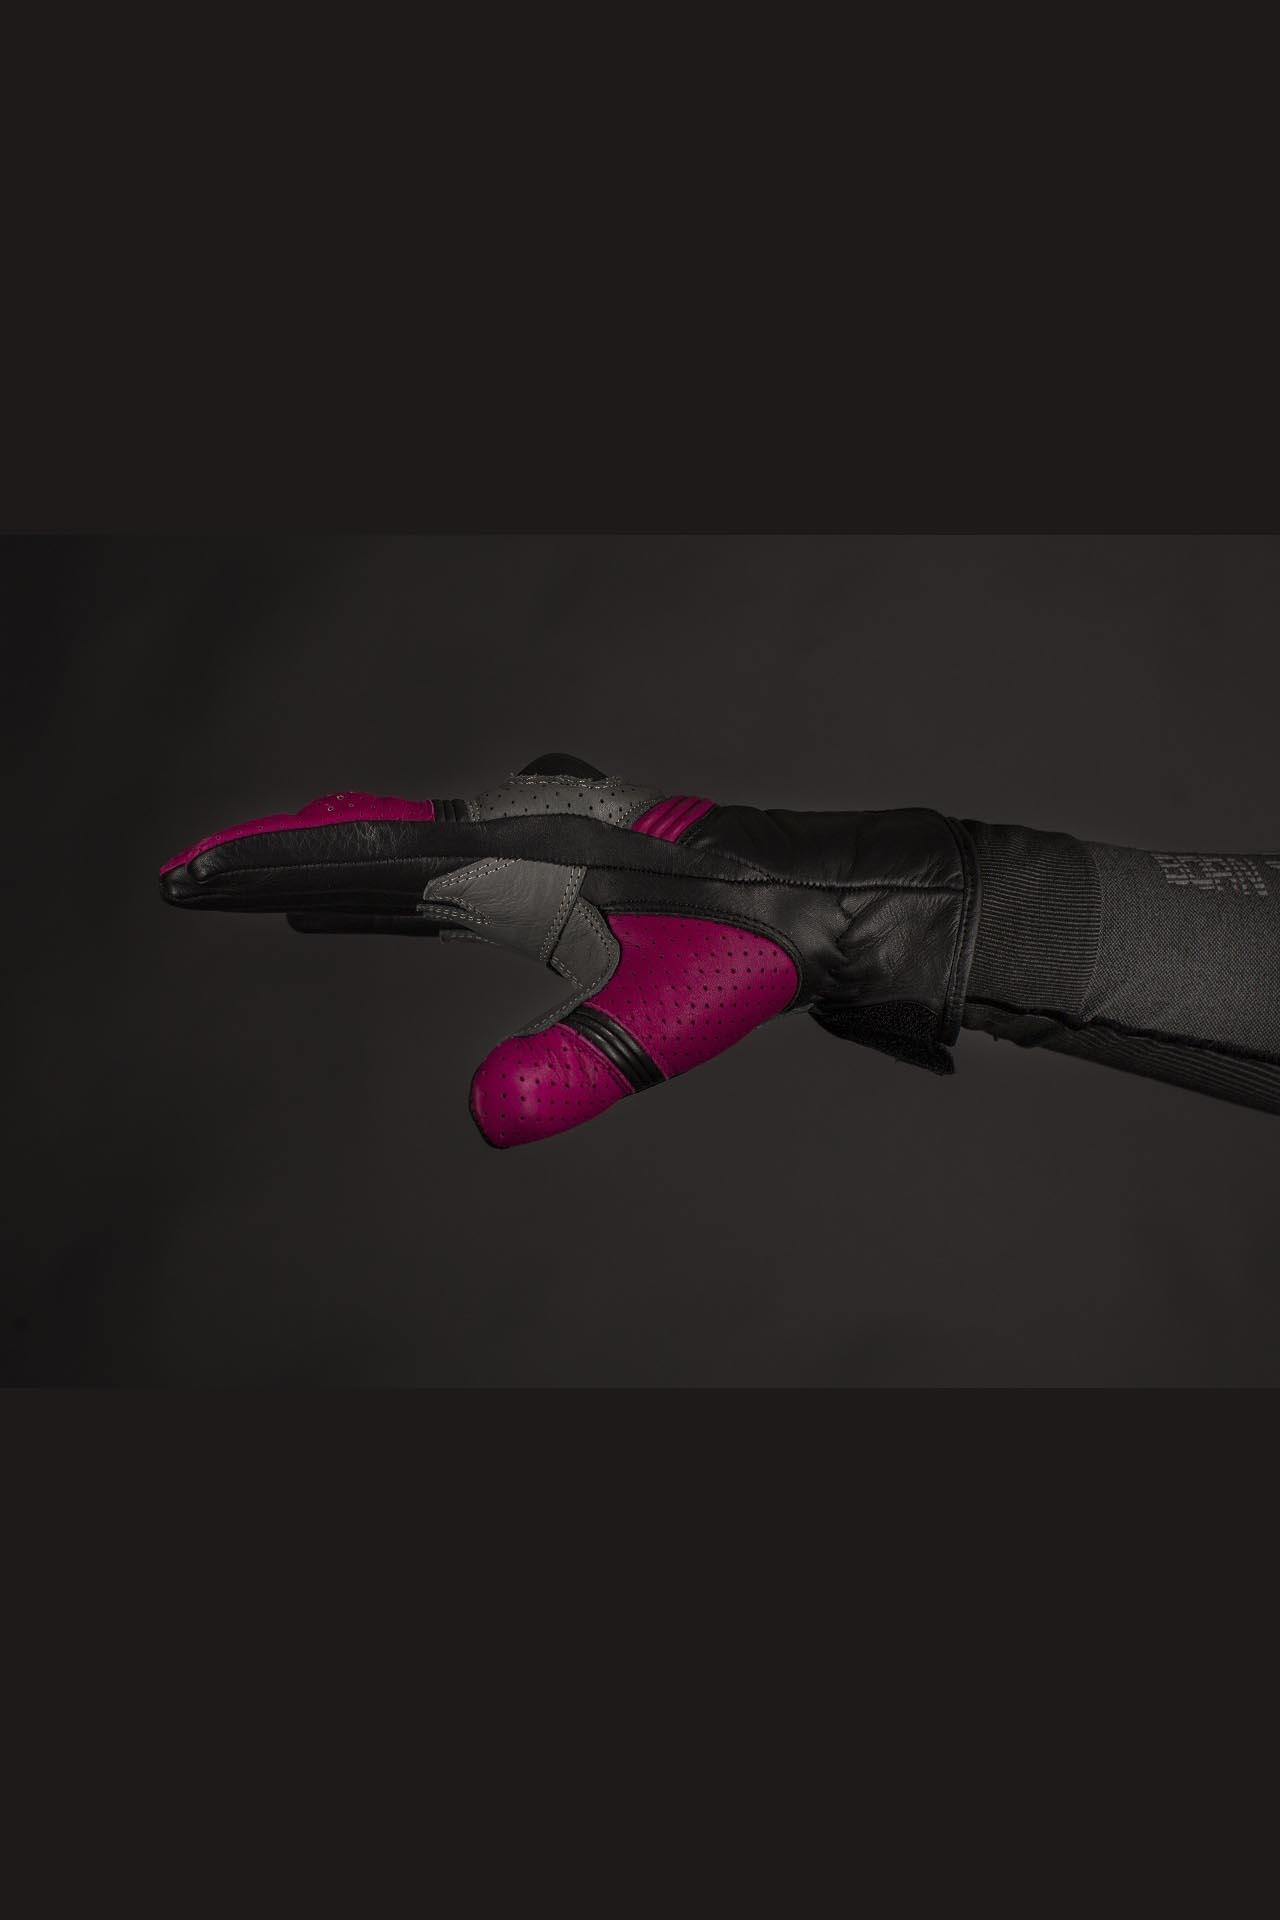 Color: Pink